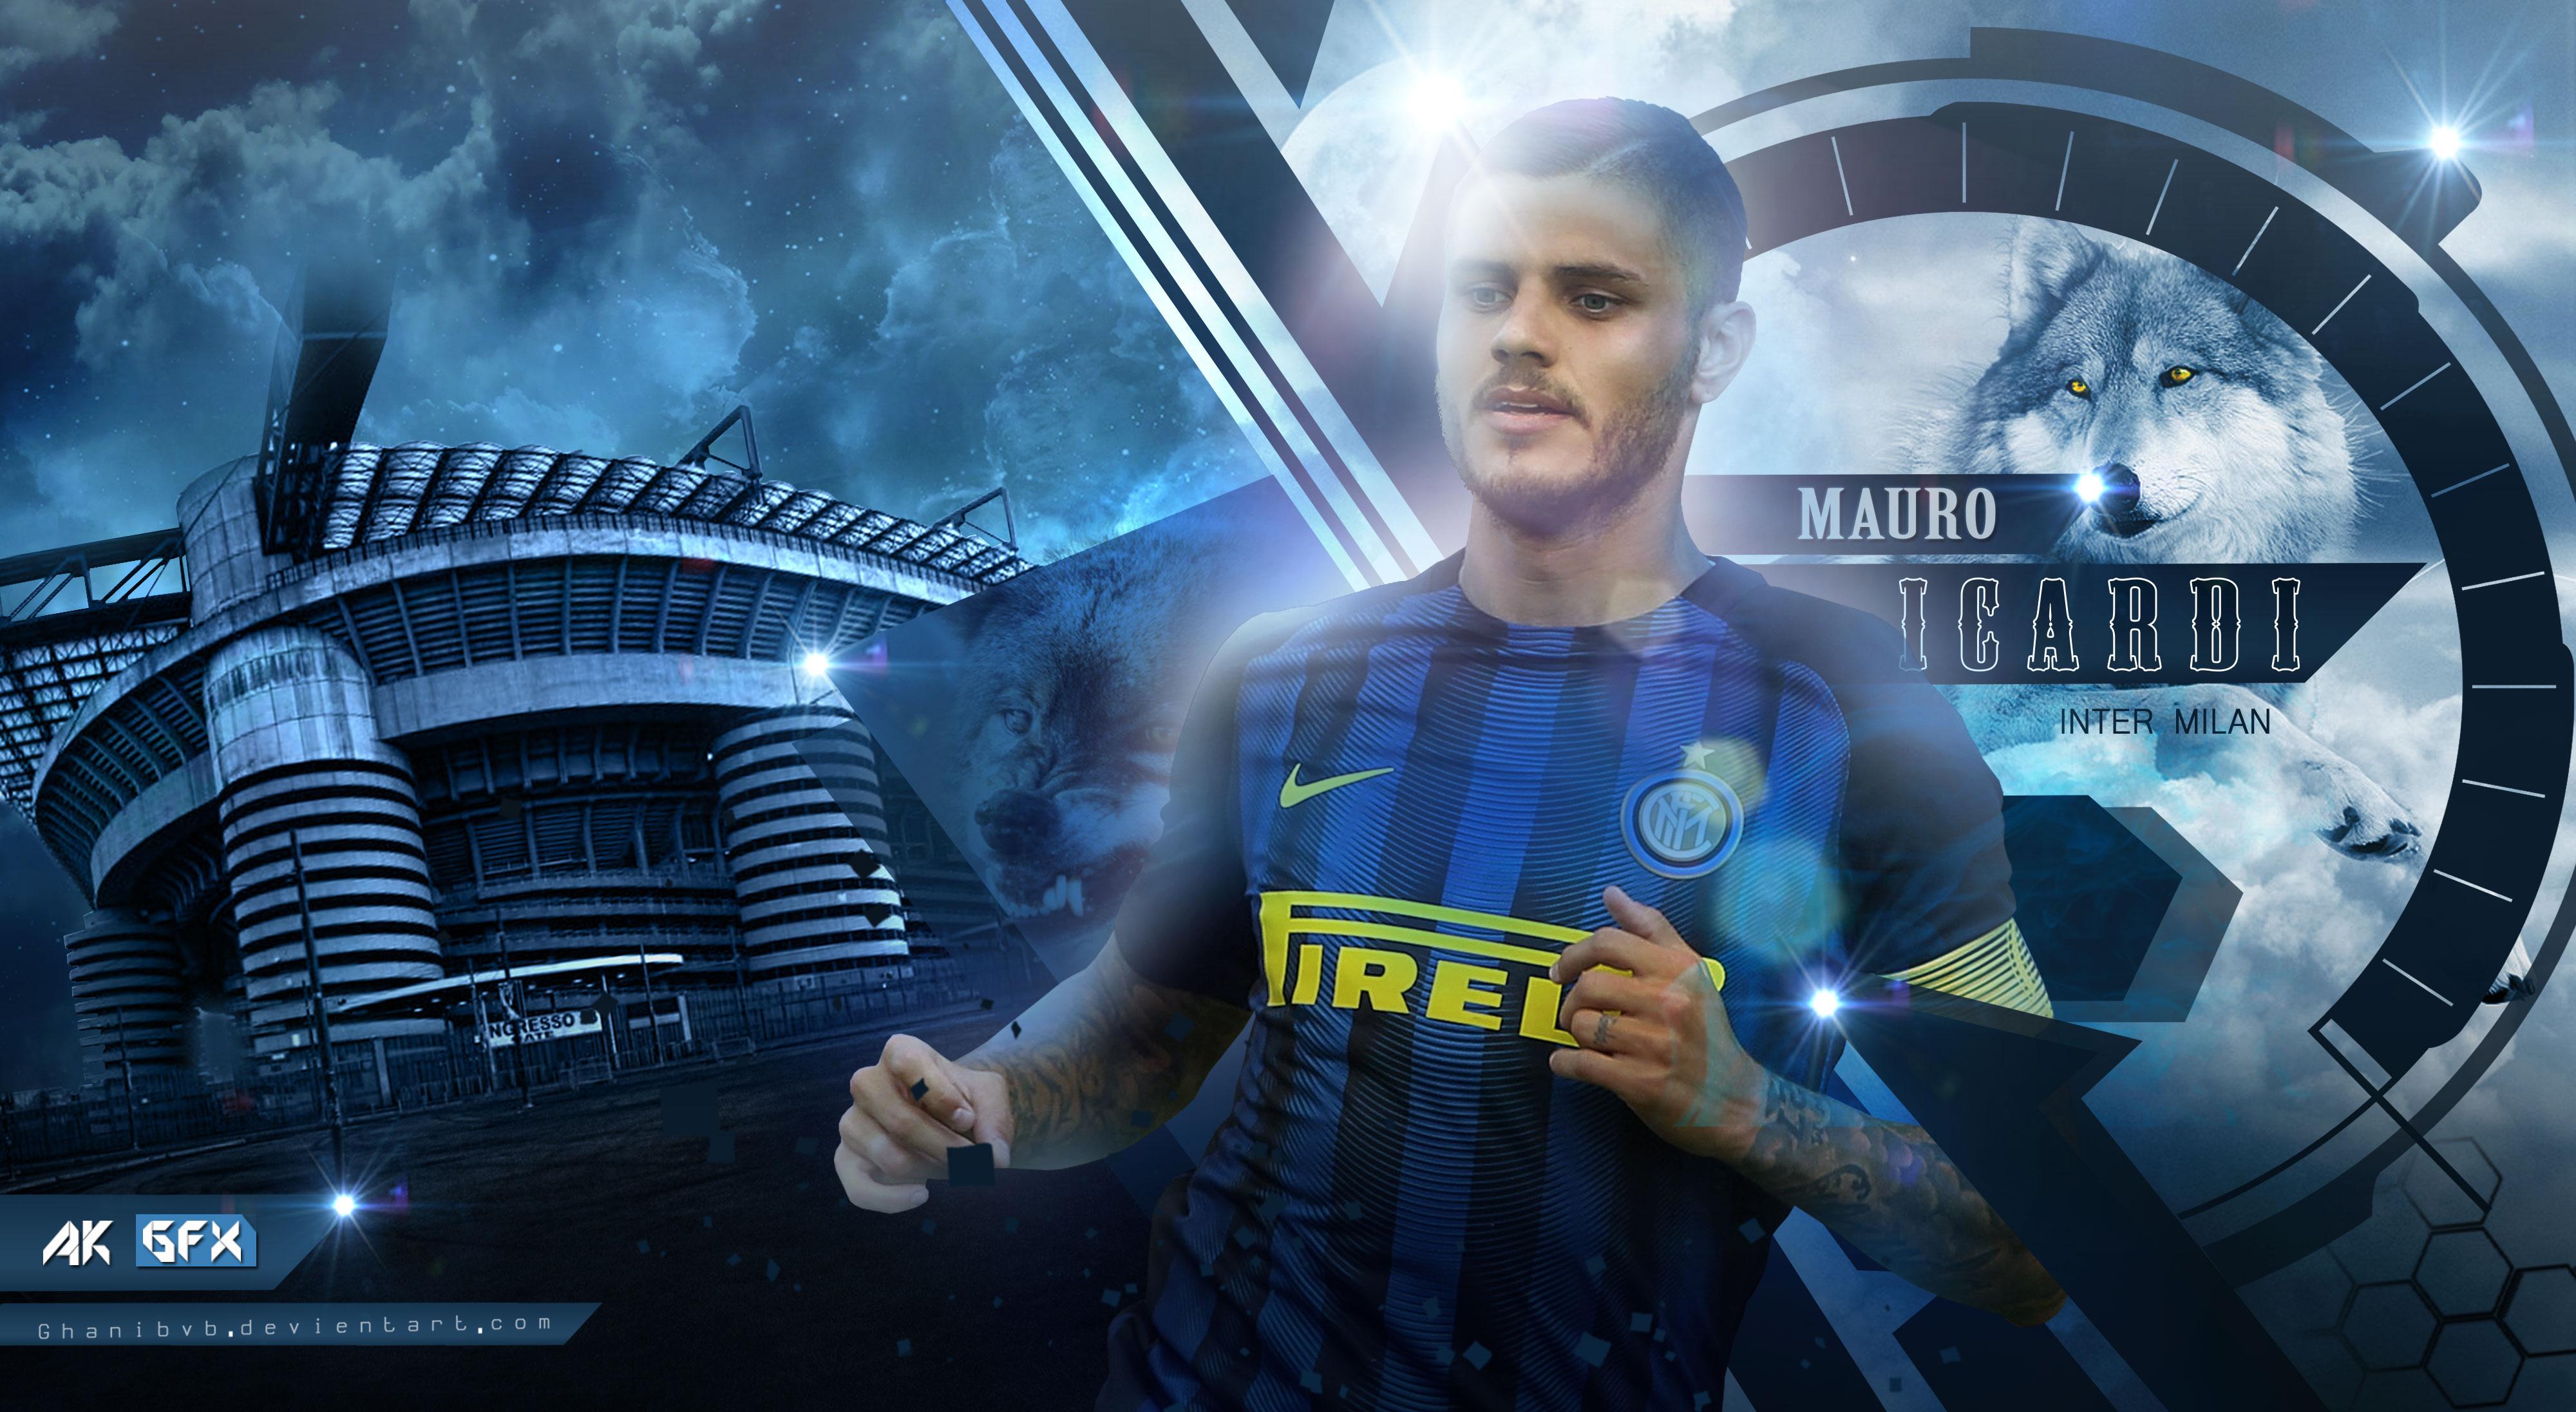 Mauro Icardi - Inter 4k Ultra HD Wallpaper